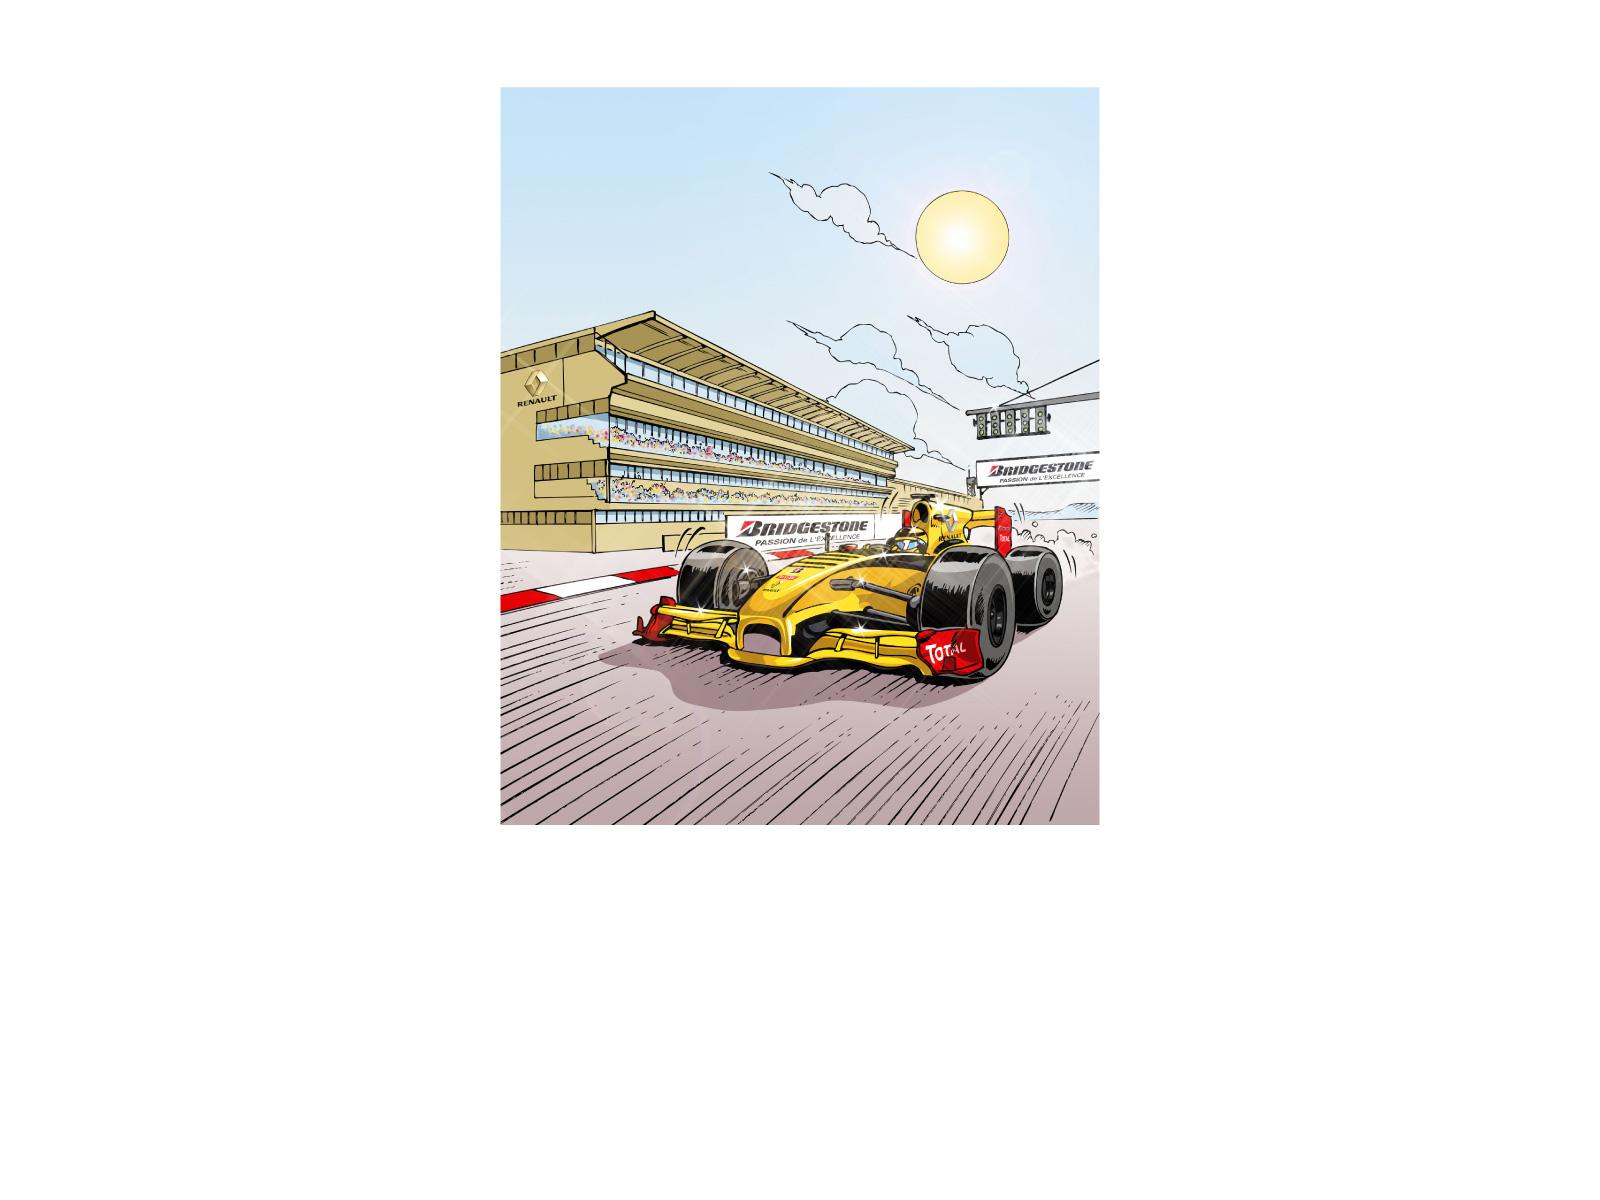 LEDISCOTOlivier-Illustrations-STUDIO BD-1402